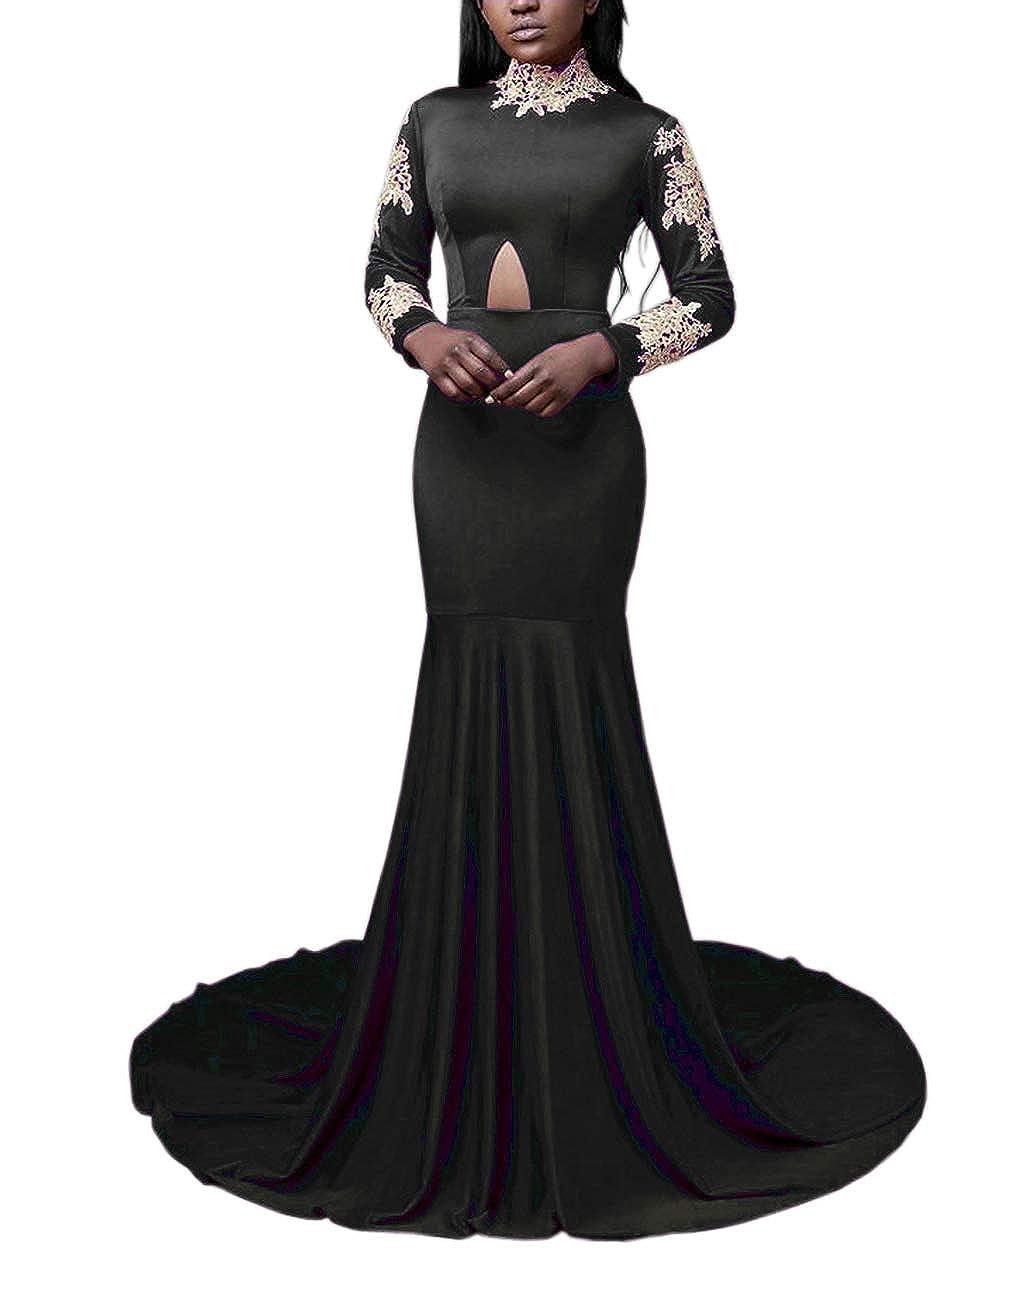 Black BridalAffair Sexy Long Mermaid Prom Dresses 2019 High Neck Long Sleeve Floor Length Party Prom Dress